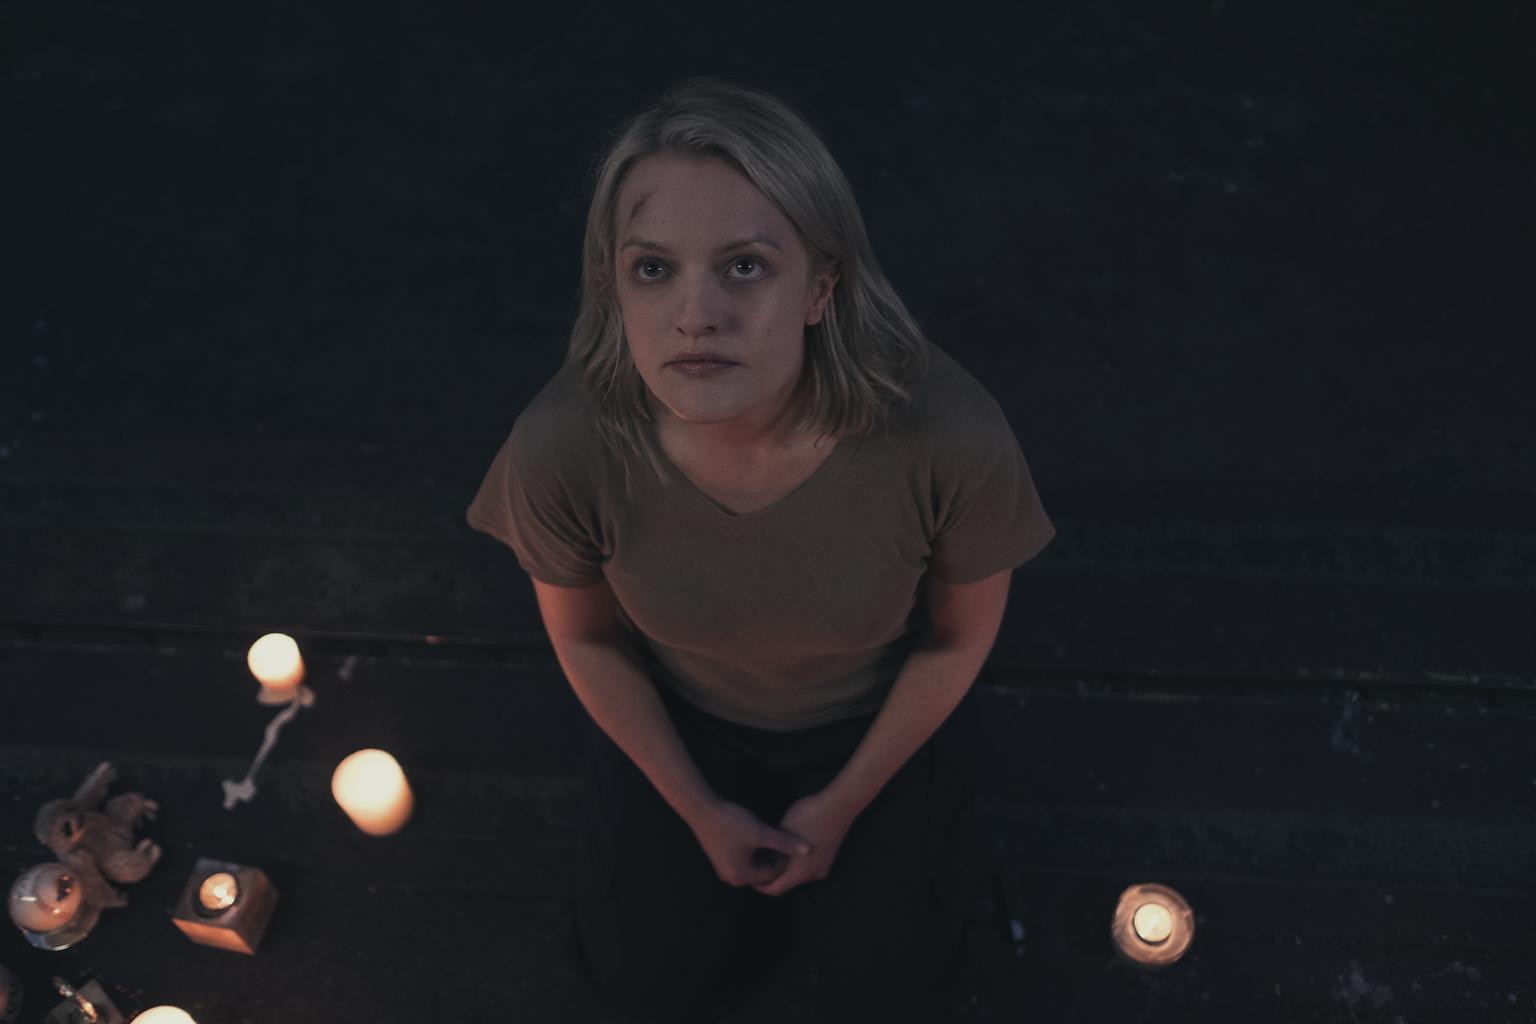 bctv 2018 handmaids tale